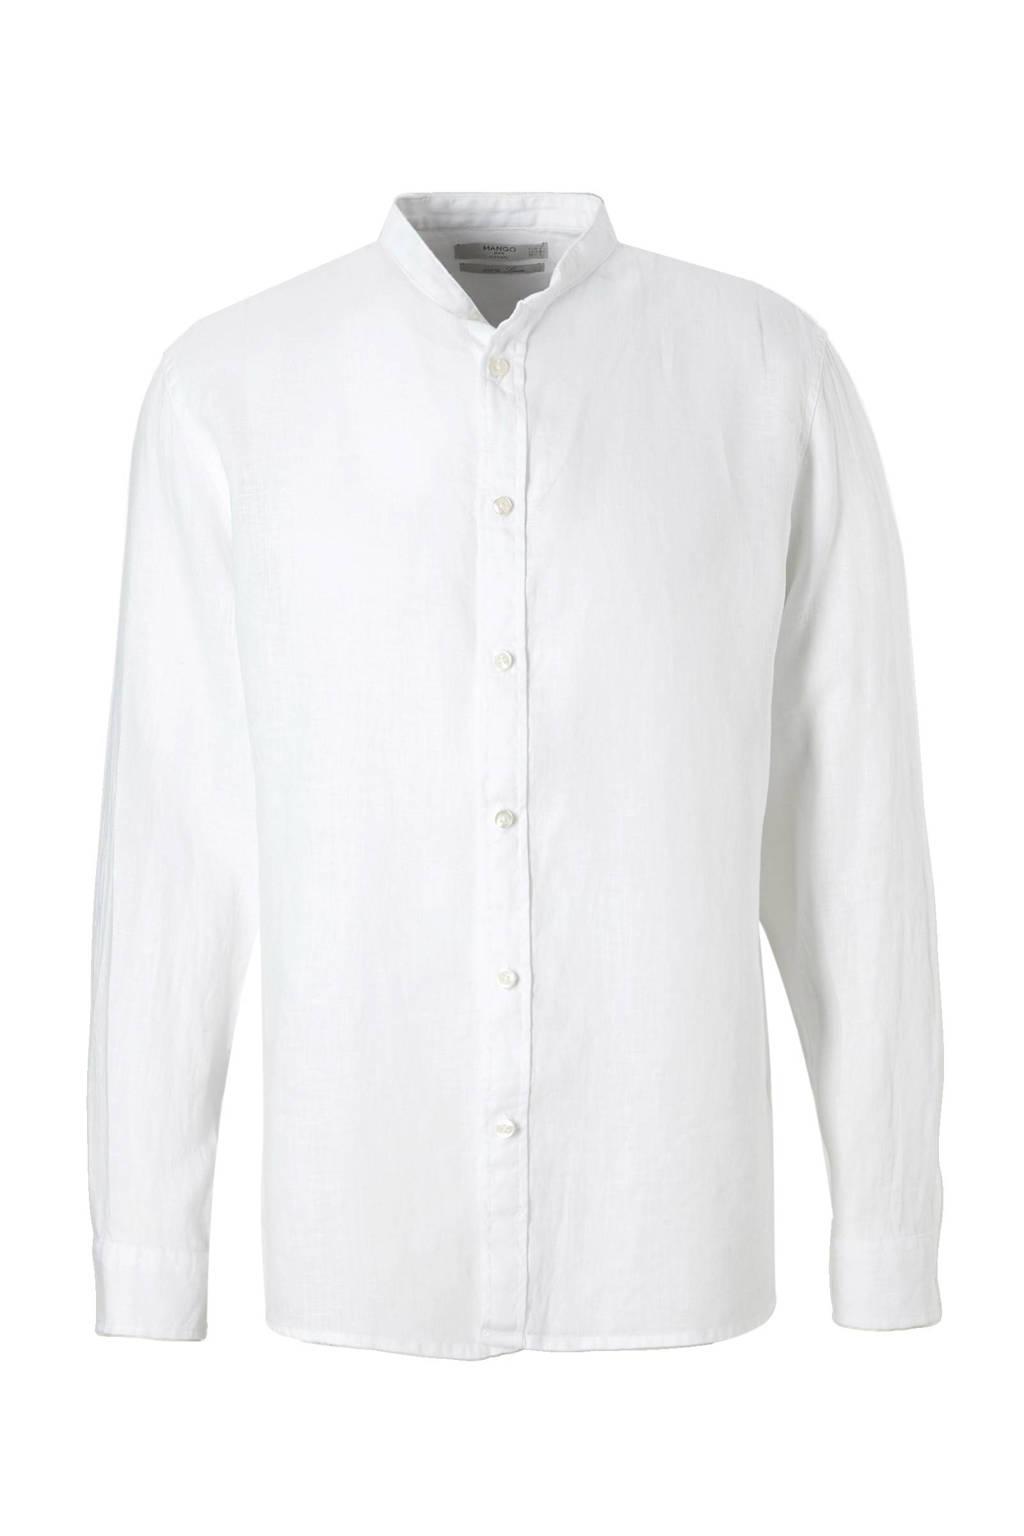 Linnen Overhemd Wit.Mango Man Linnen Overhemd Wehkamp